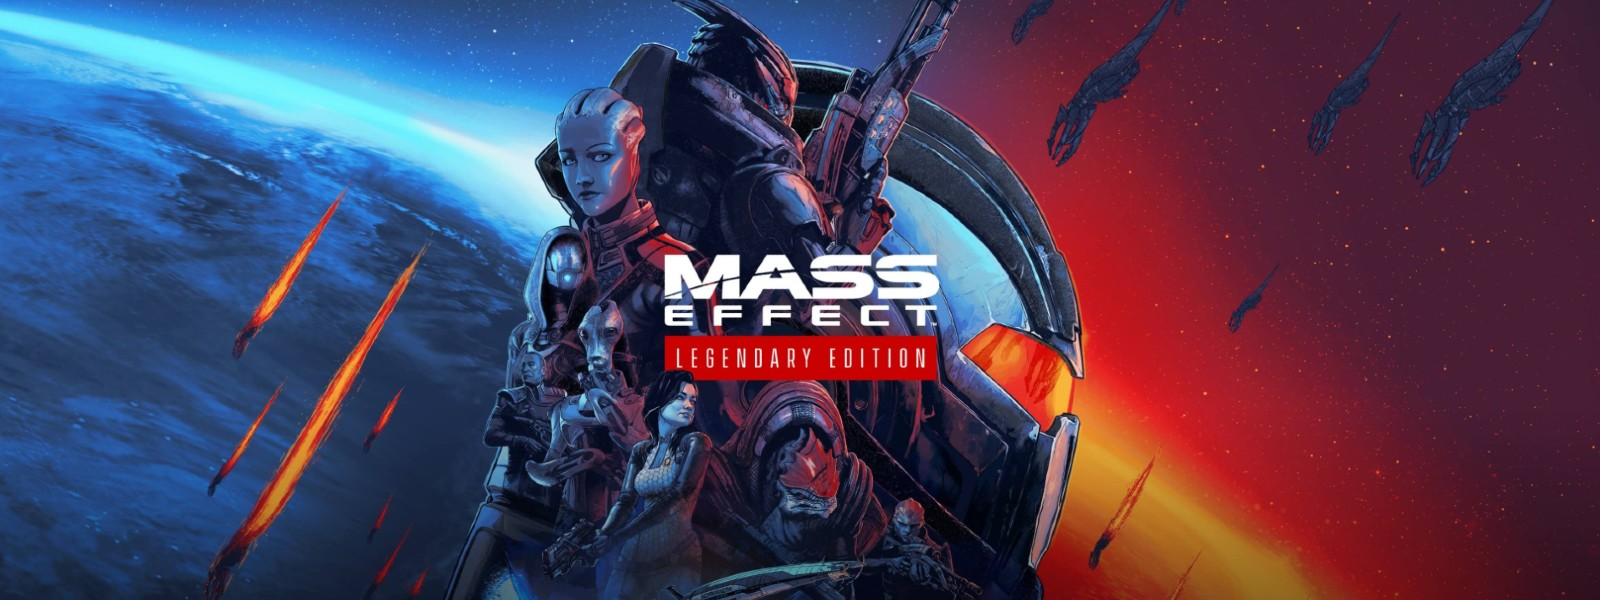 Mass Effect Legendary Edition Premiera Na Allegro Pl